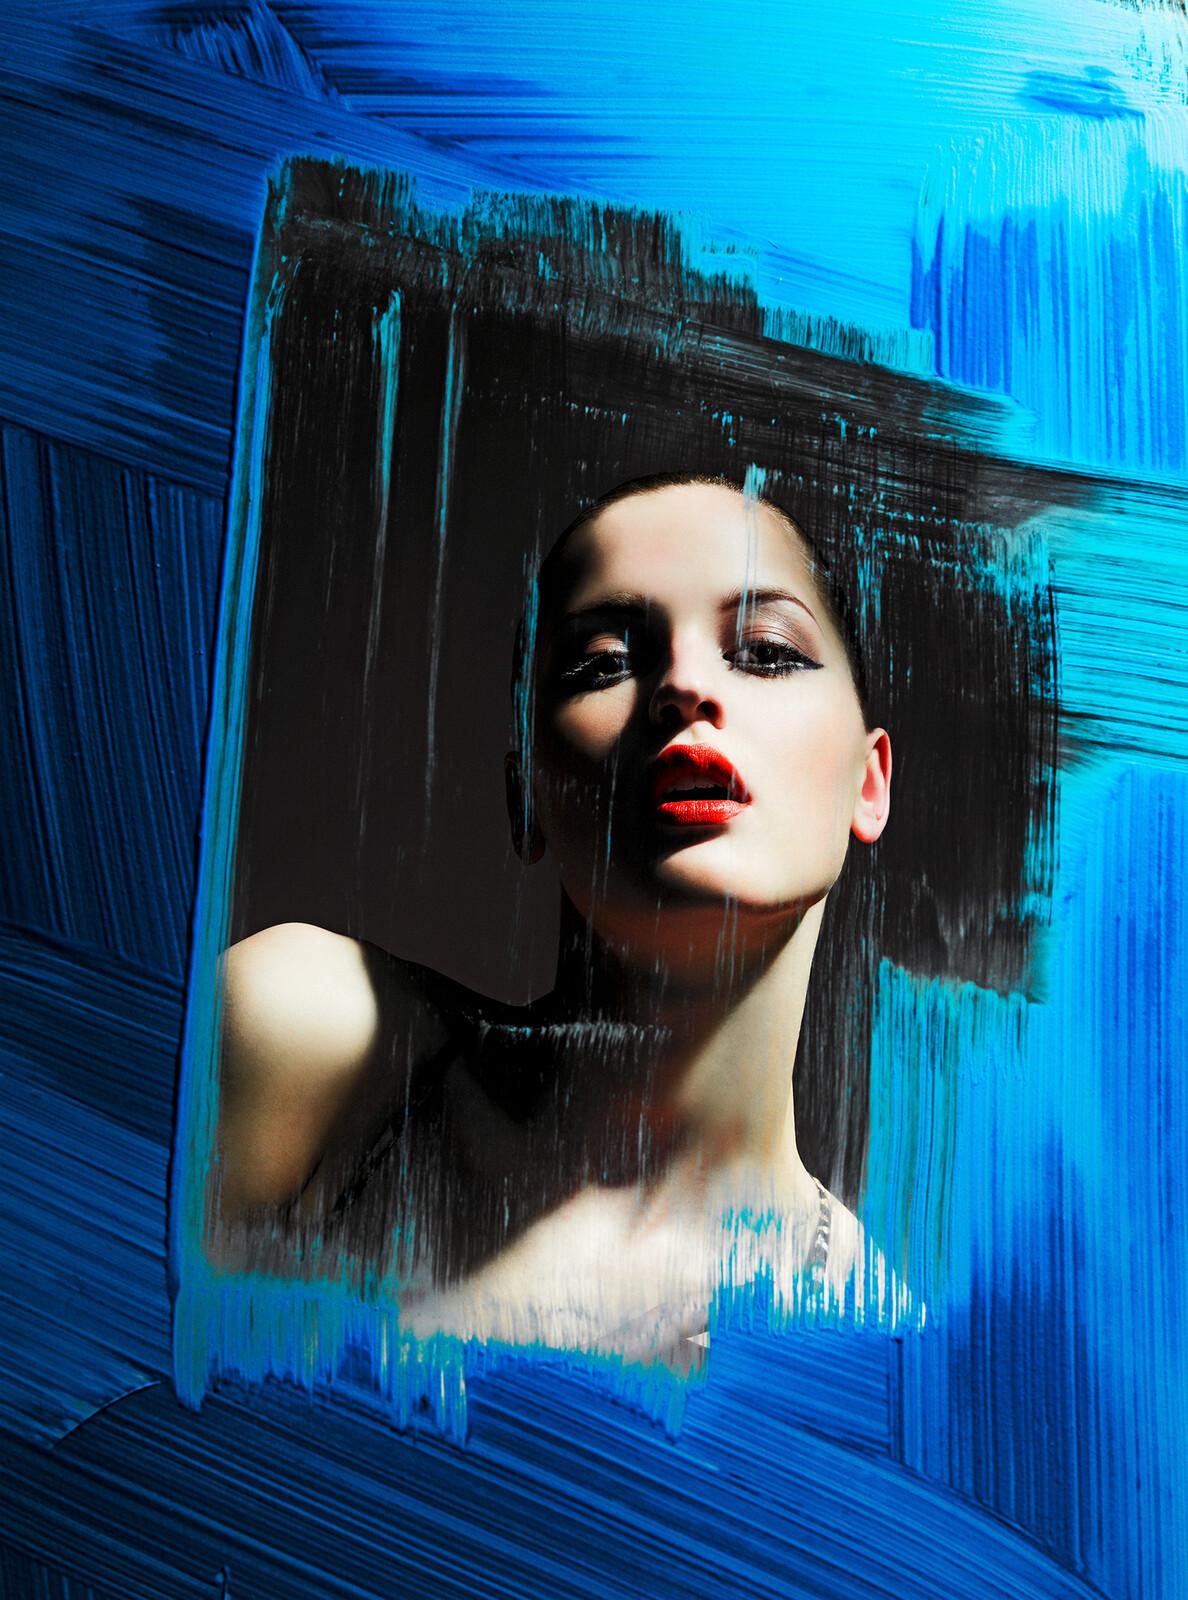 Blue Window - Alexander Straulino   Trunk Archive